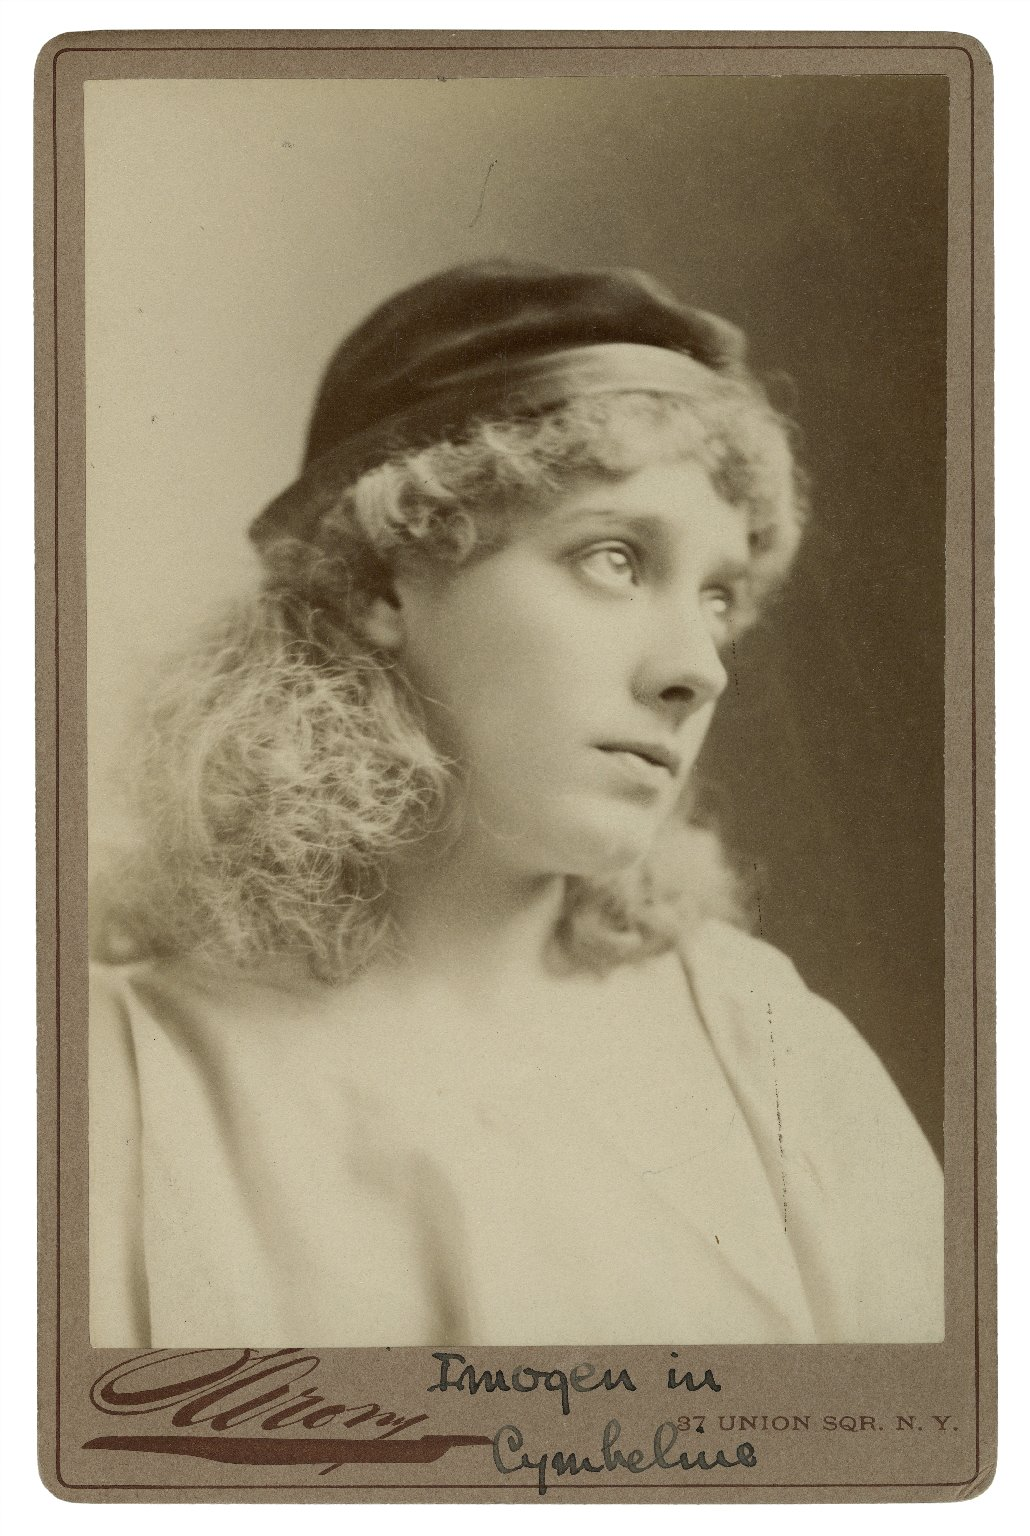 [Julia Marlowe as] Imogen in [Shakespeare's] Cymbeline [graphic] / Sarony.